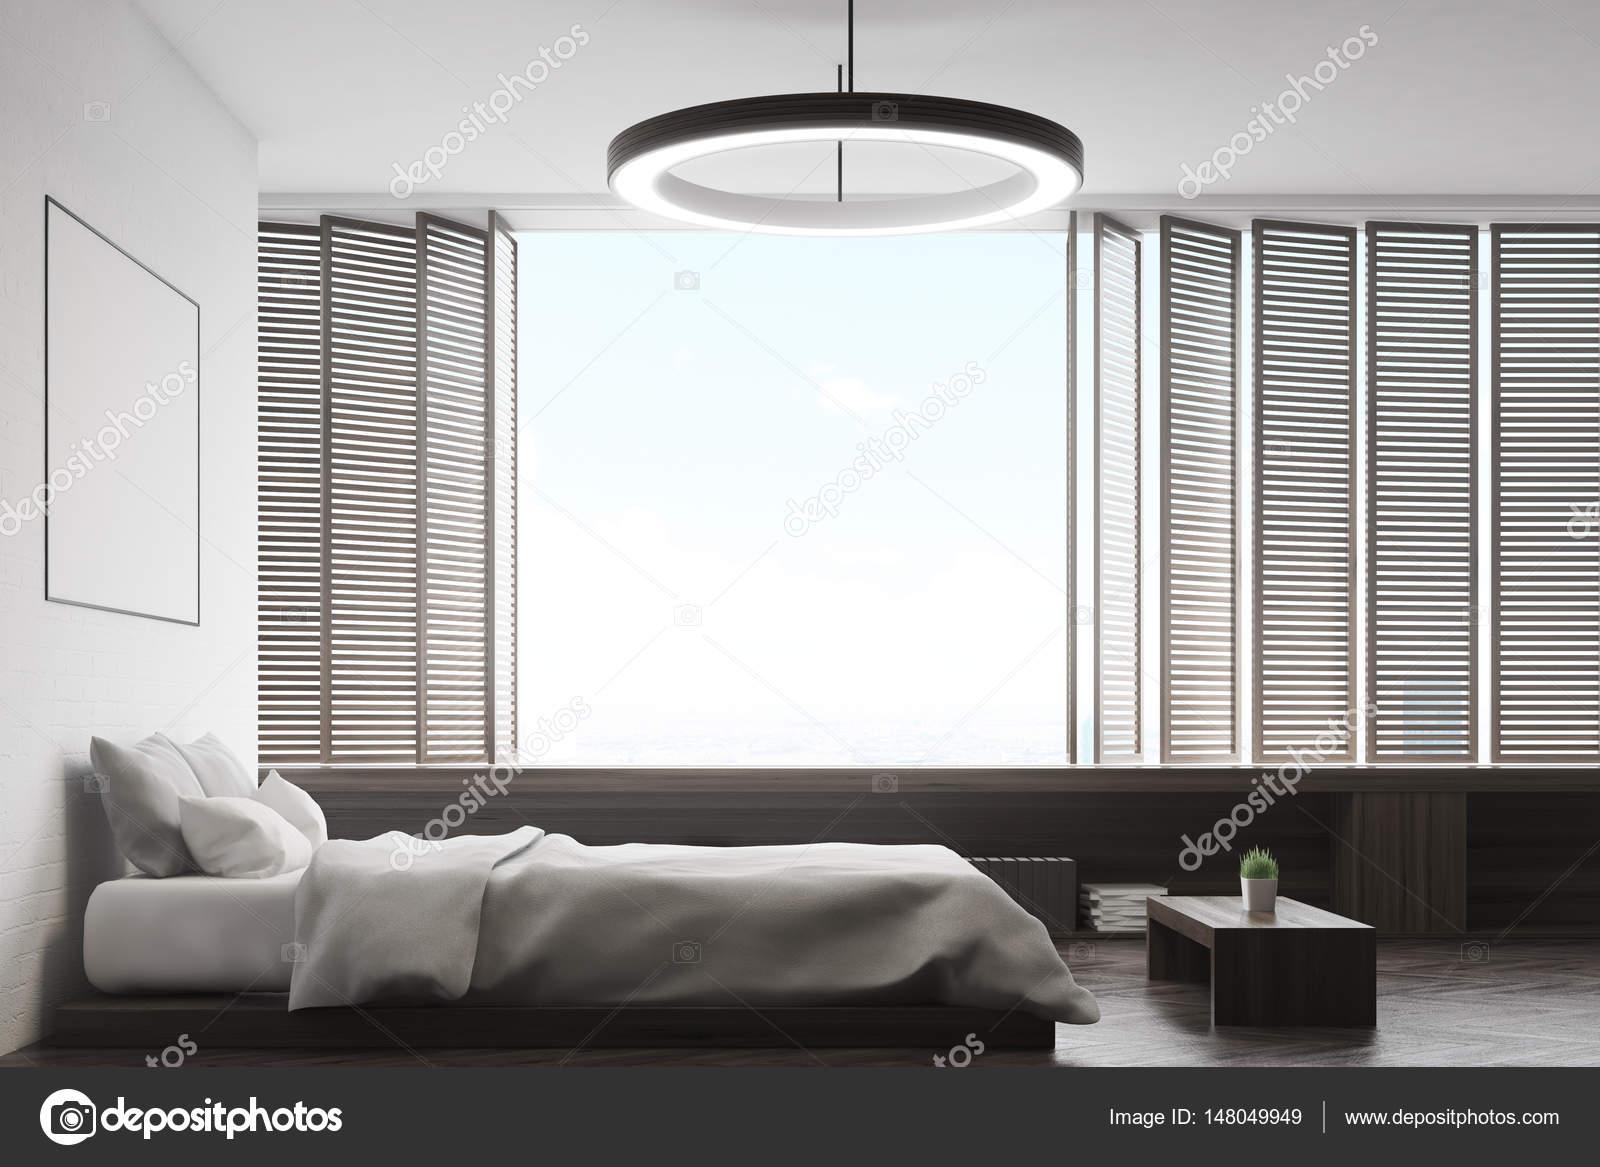 Slaapkamer met een bankje, kant — Stockfoto © denisismagilov #148049949